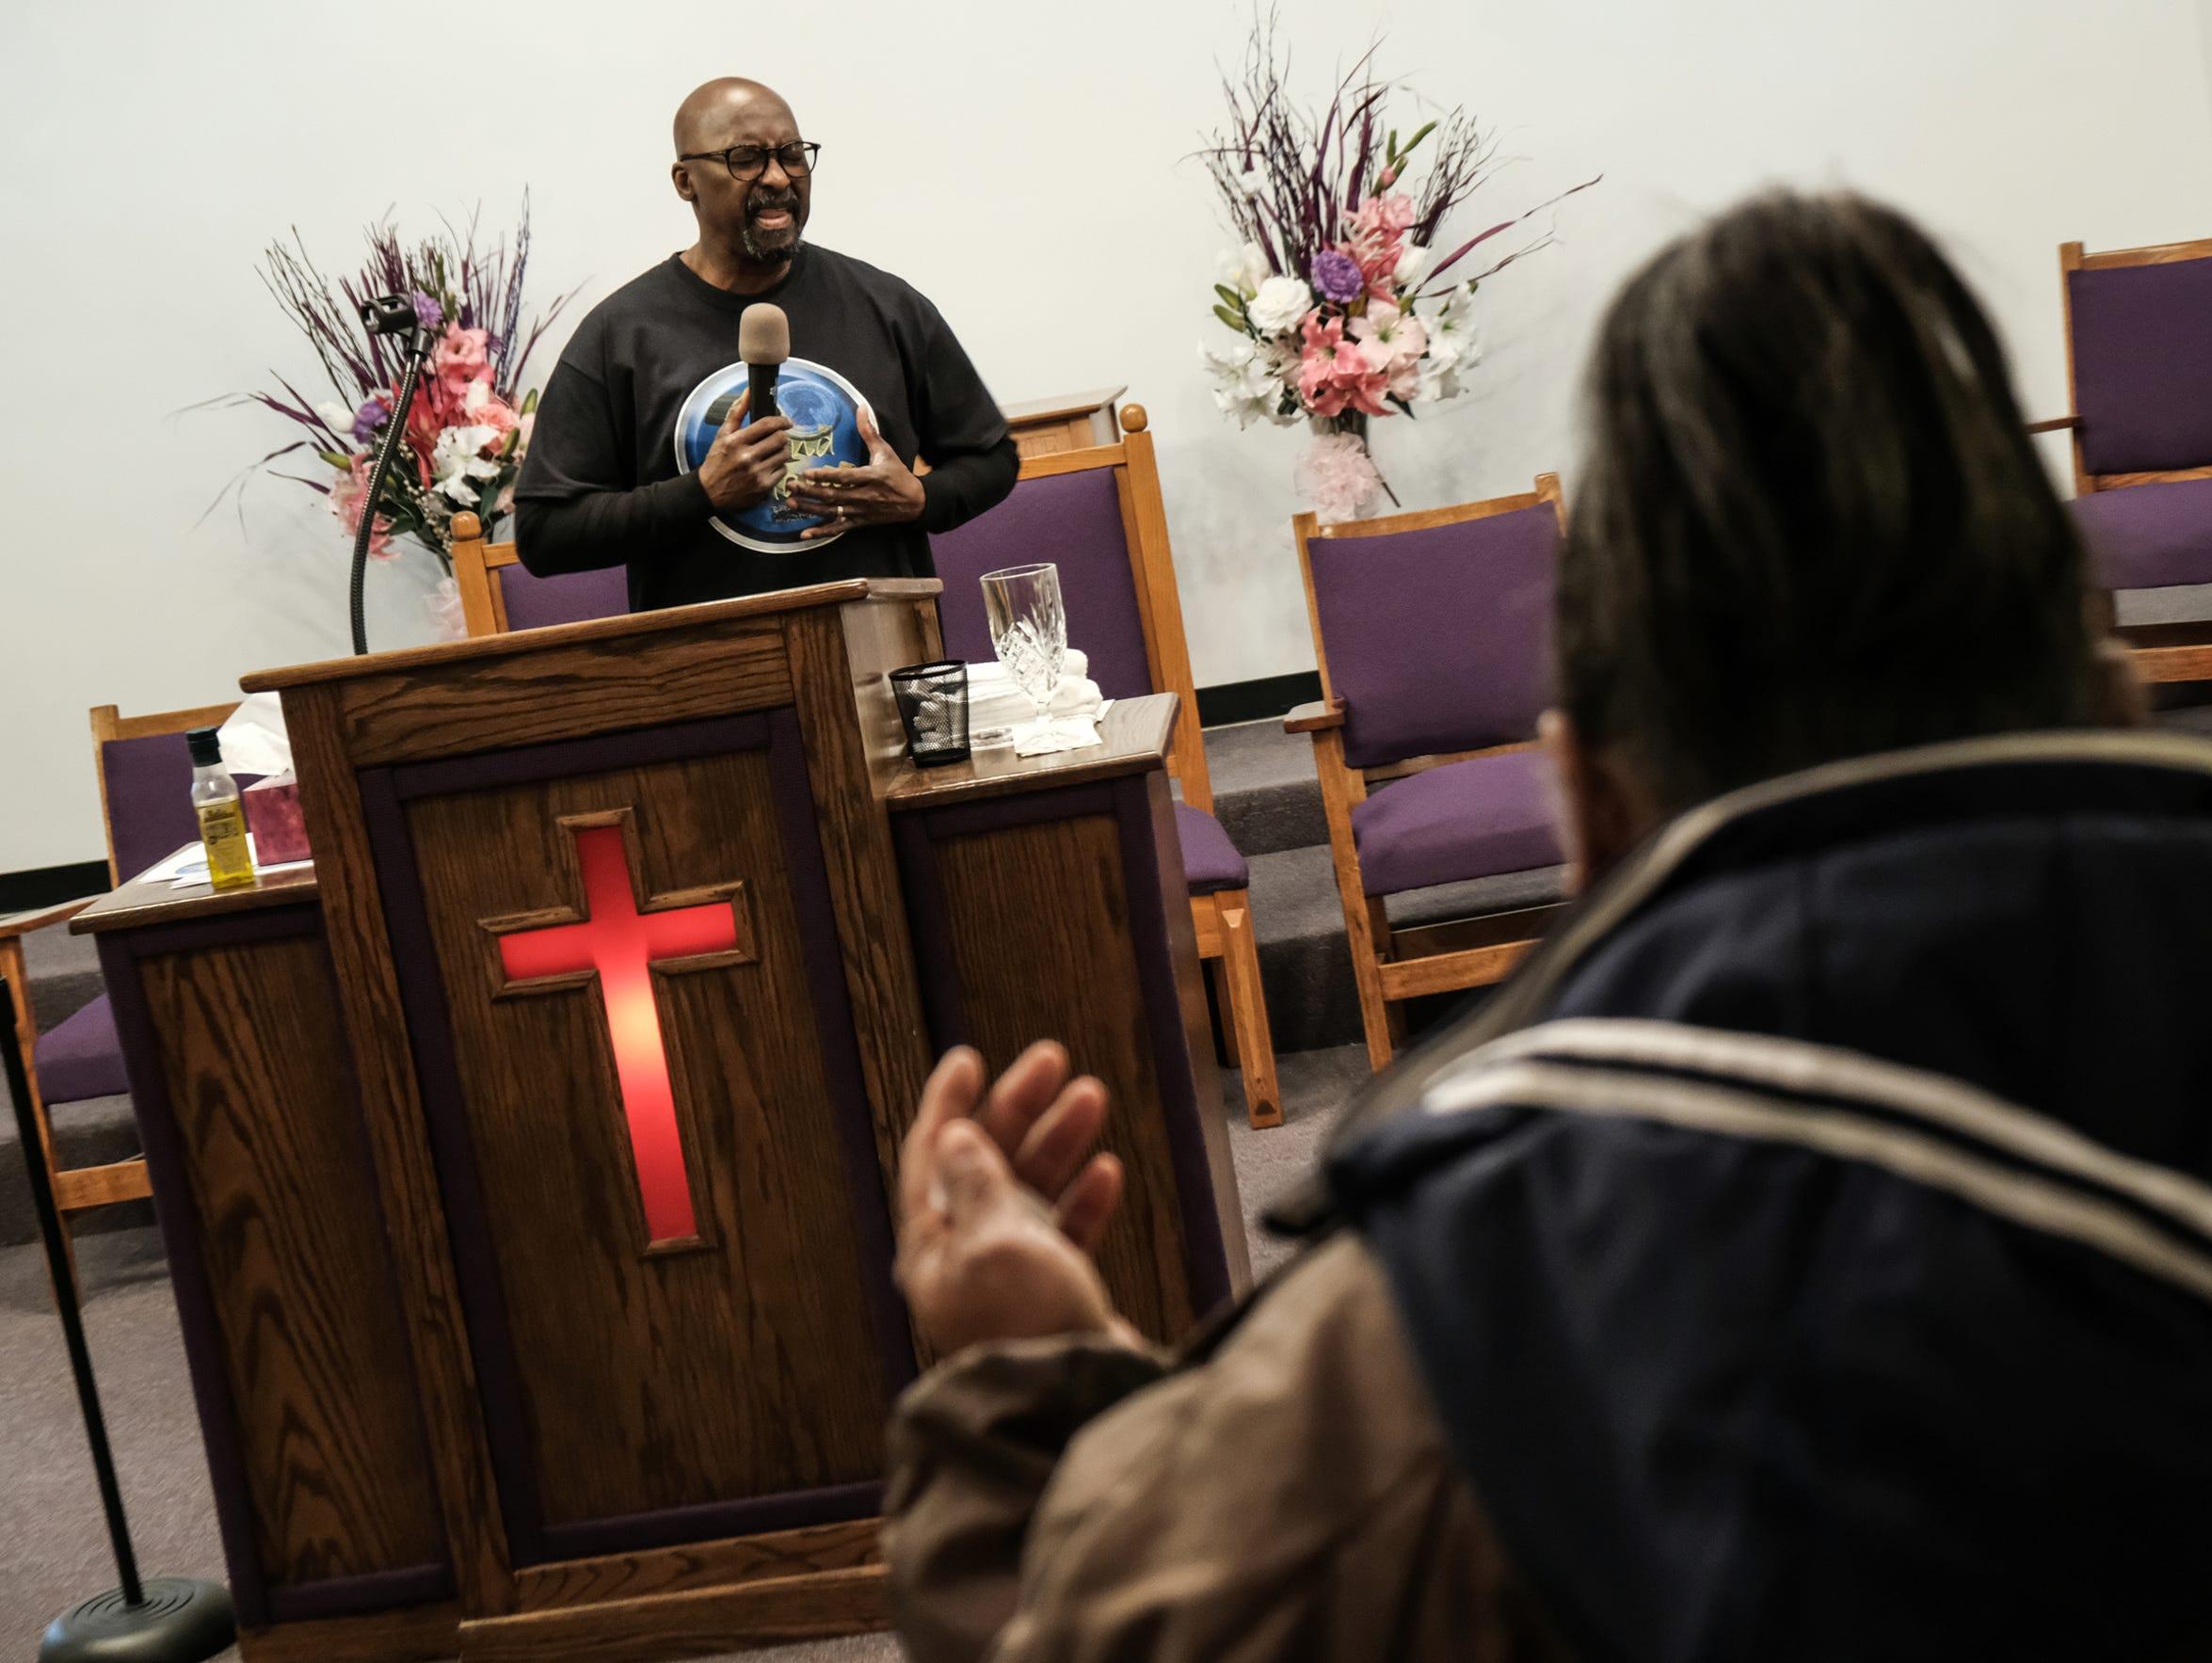 Elder Charles L. Heath Jr., pastor of 2nd Chance Christian